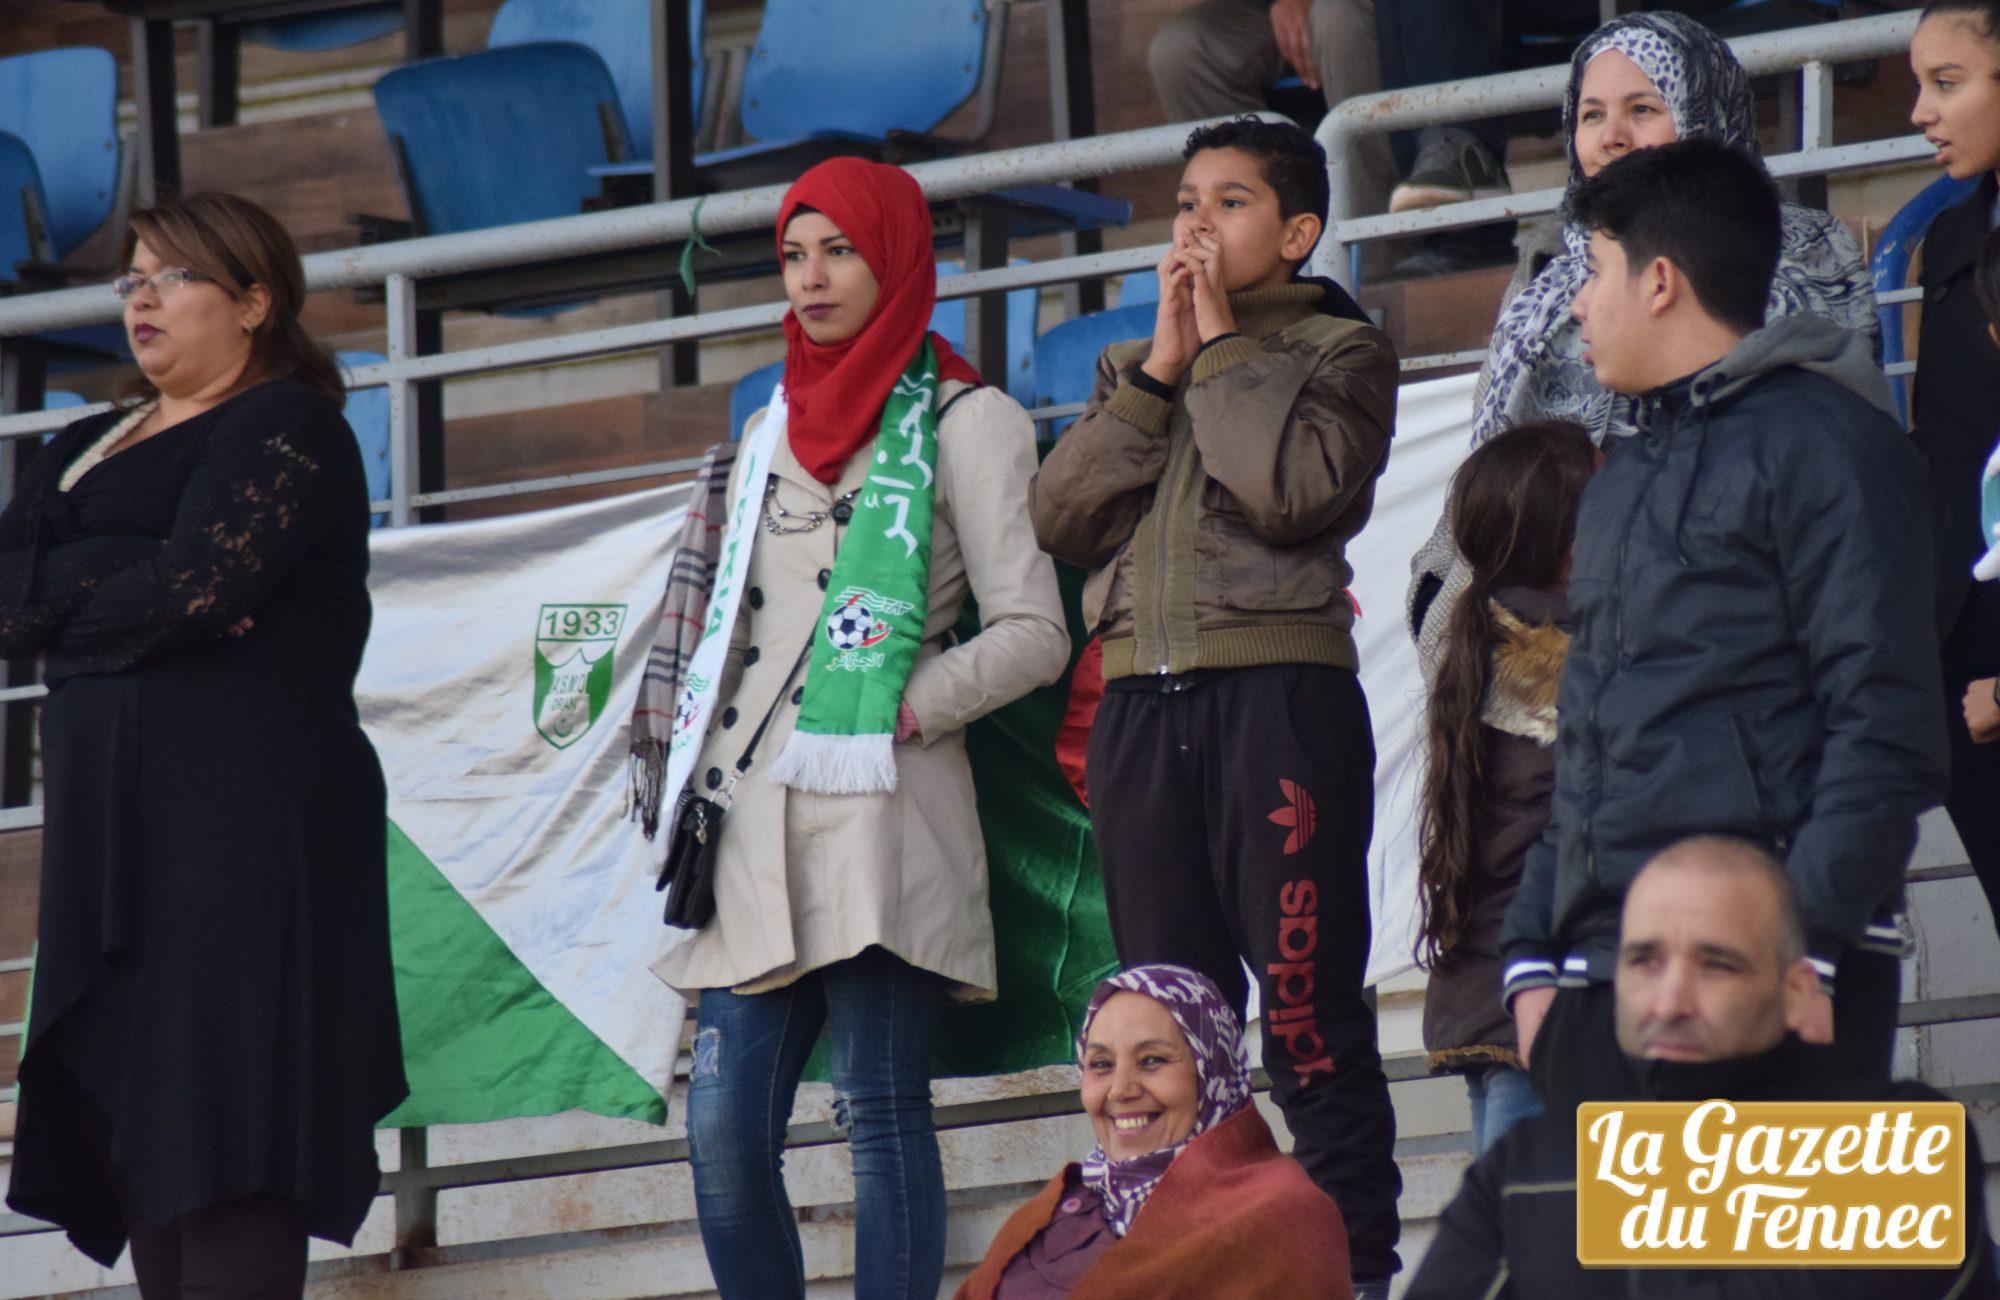 rugby-algerie-public-famille-sourire